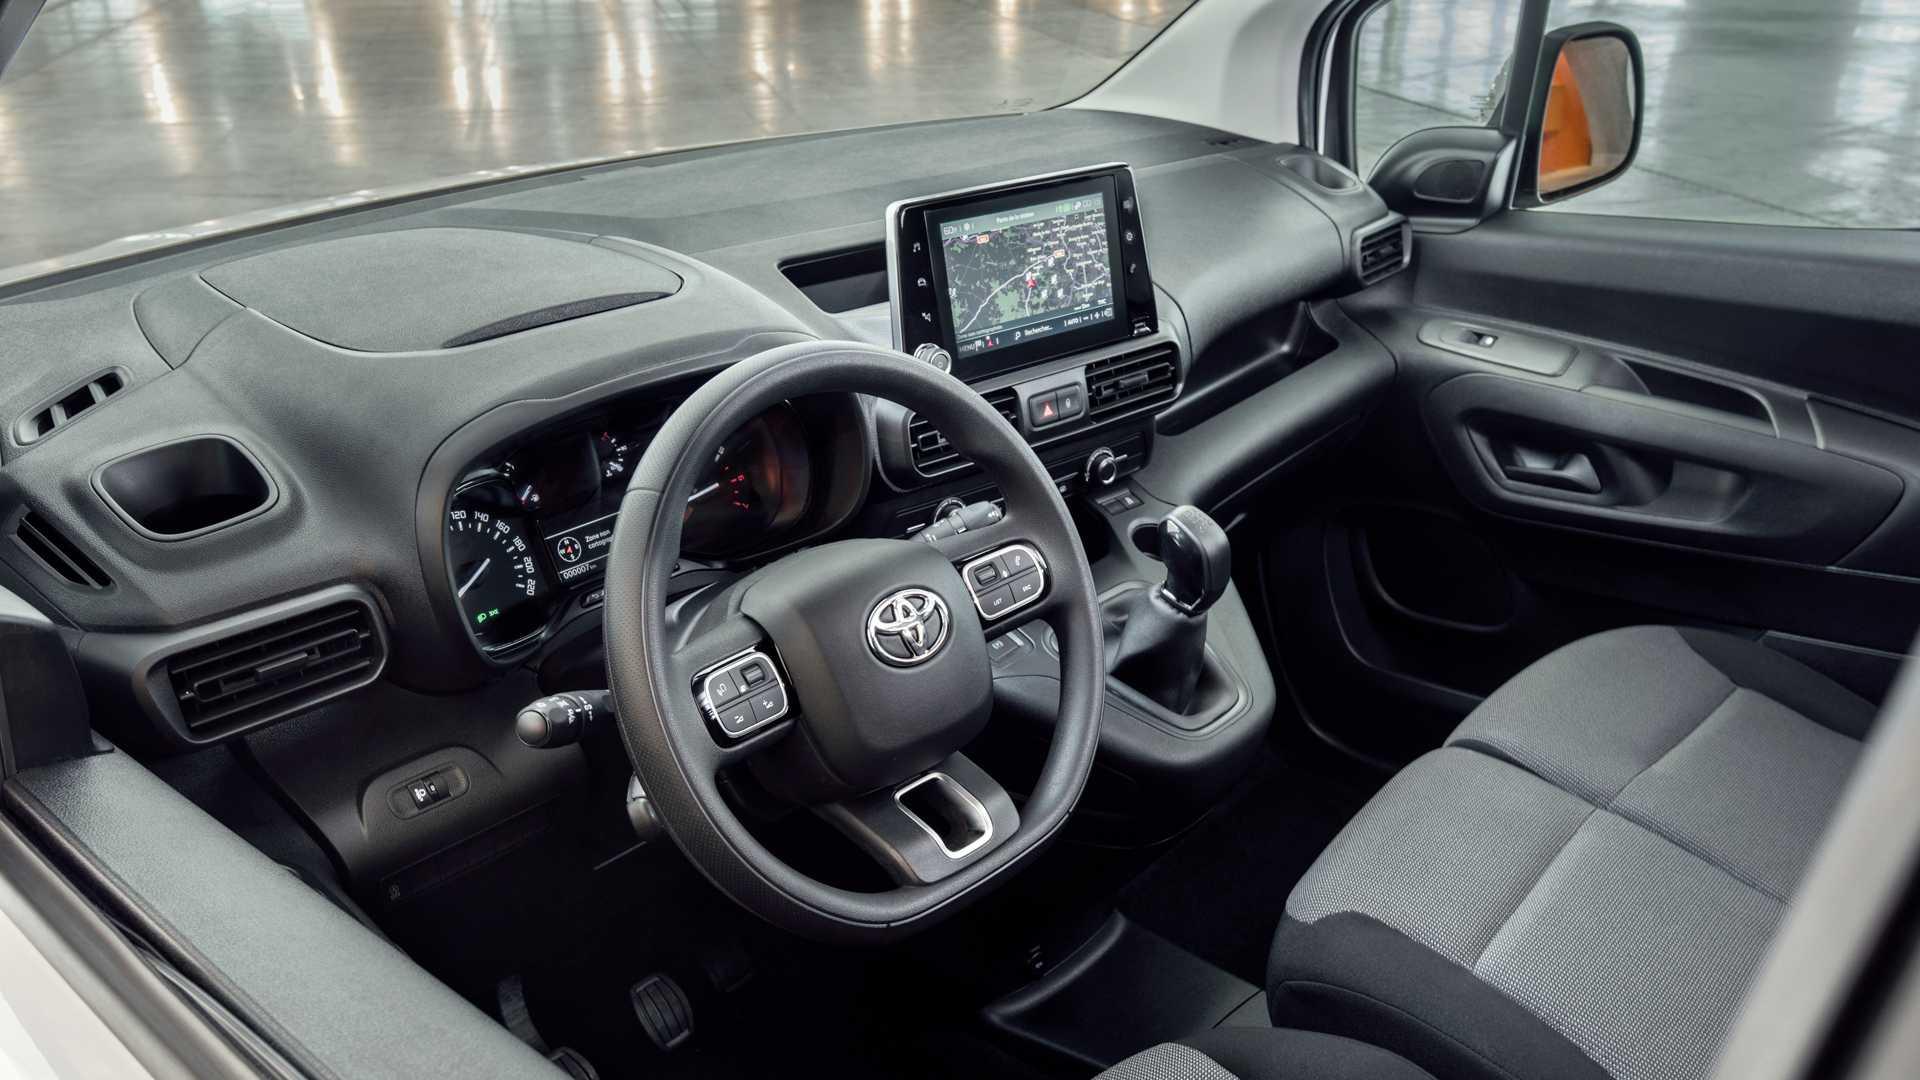 2021 Toyota Proace City 1.5 AT   Arabam Kaç Litre Yakar   Yakıt Tüketimi